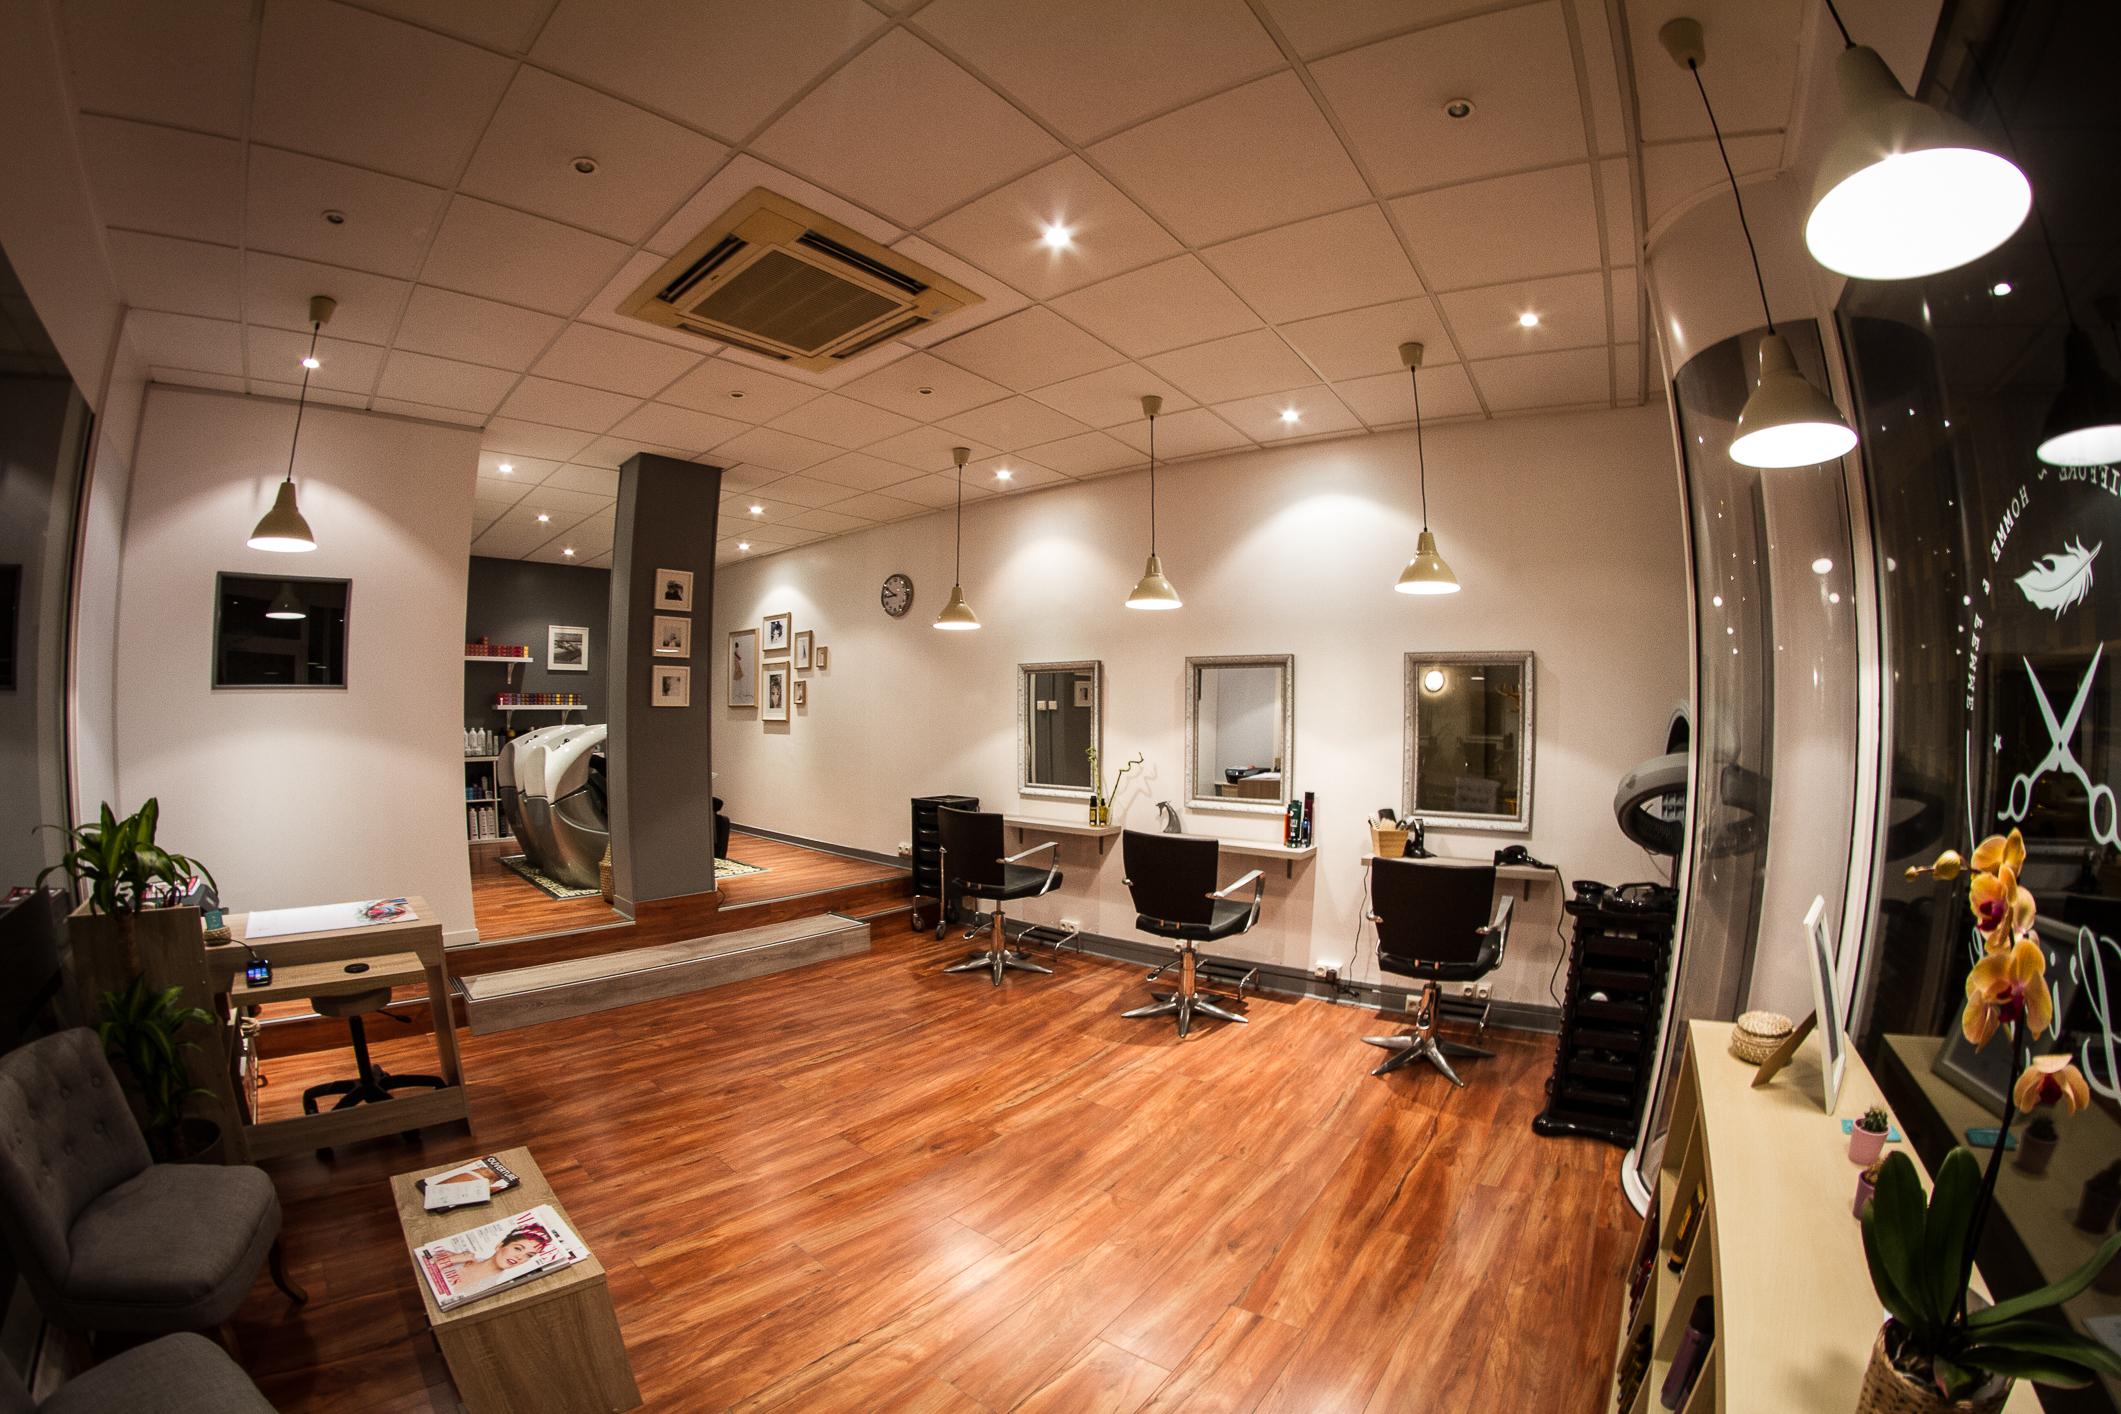 L 39 idylle salon de coiffure tours avis tarifs horaires for Avis salon de coiffure